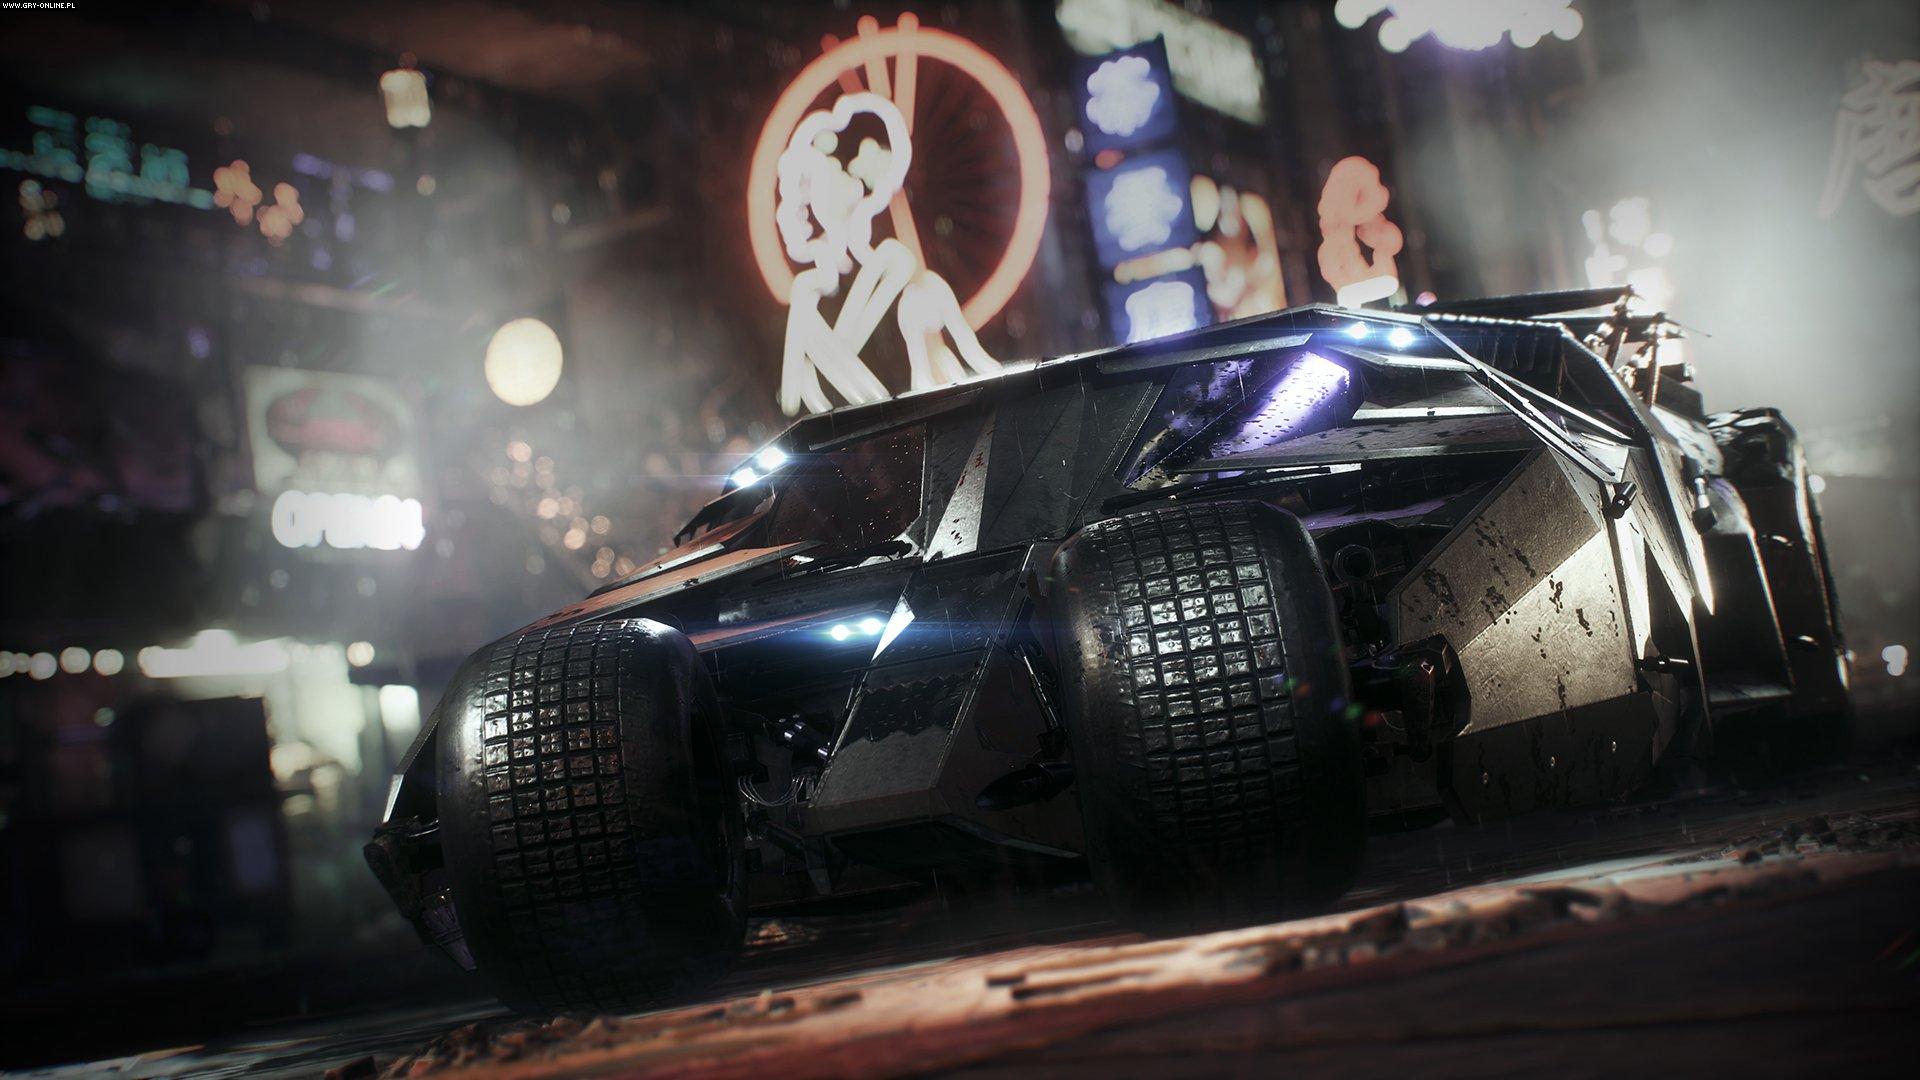 Batman: Arkham Knight PC, PS4, XONE Games Image 5/63, RockSteady Studios, Warner Bros Interactive Entertainment